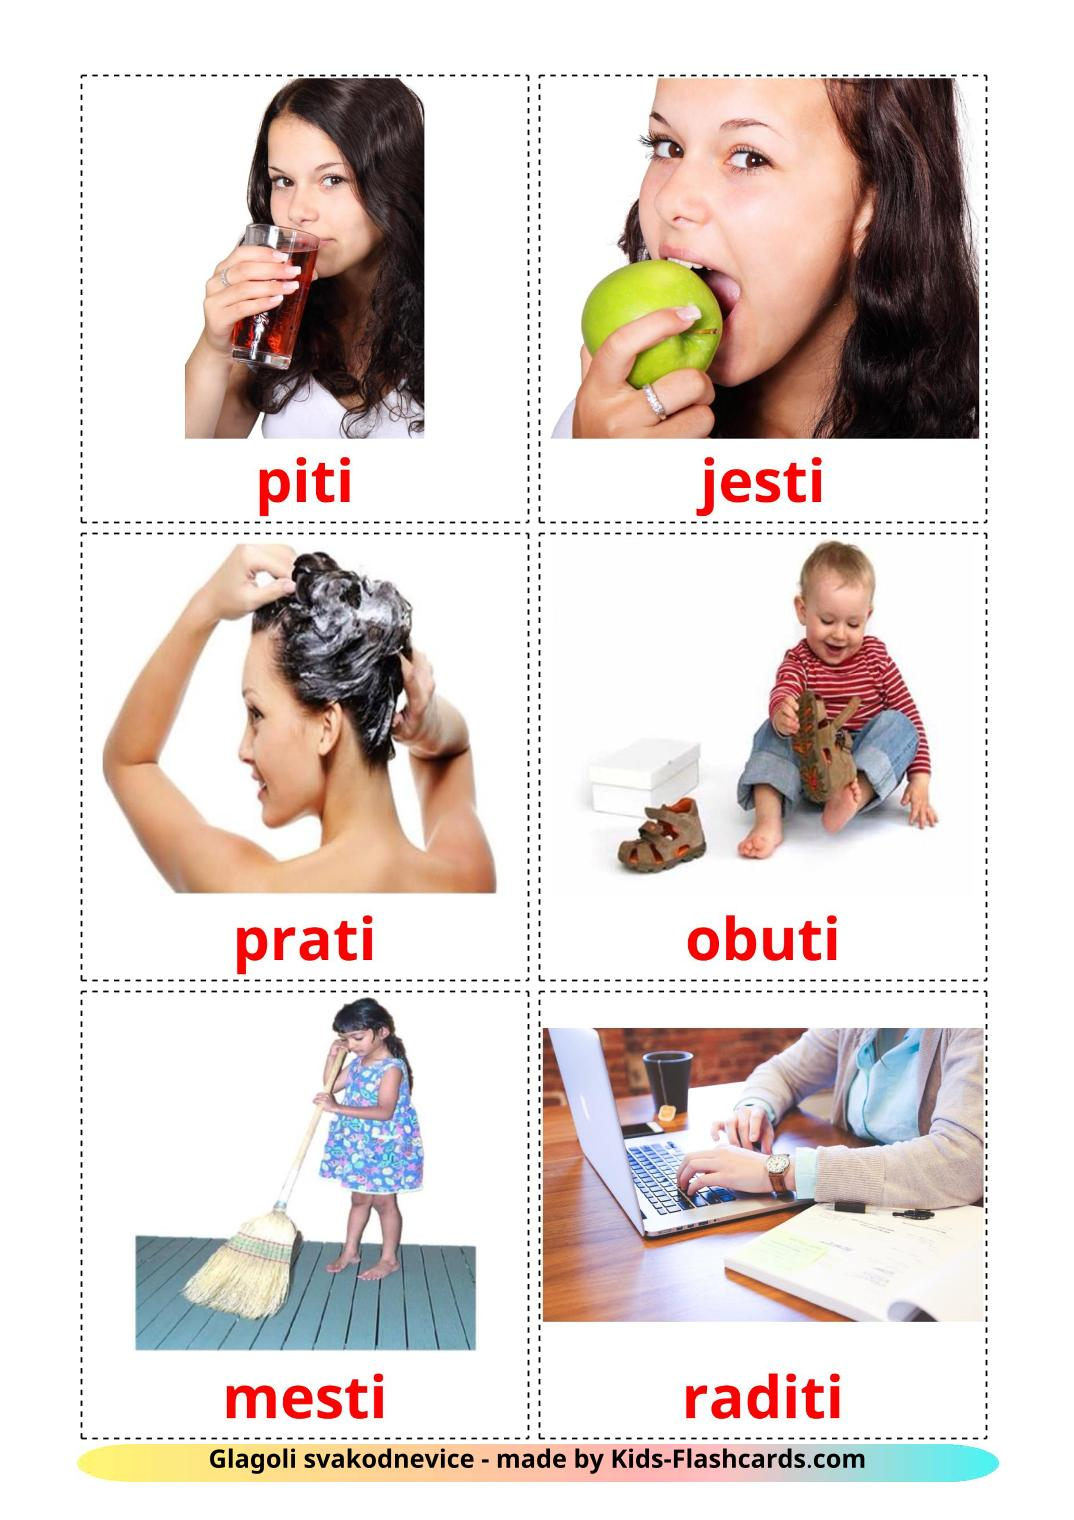 Routine verbs - 33 Free Printable croatian Flashcards